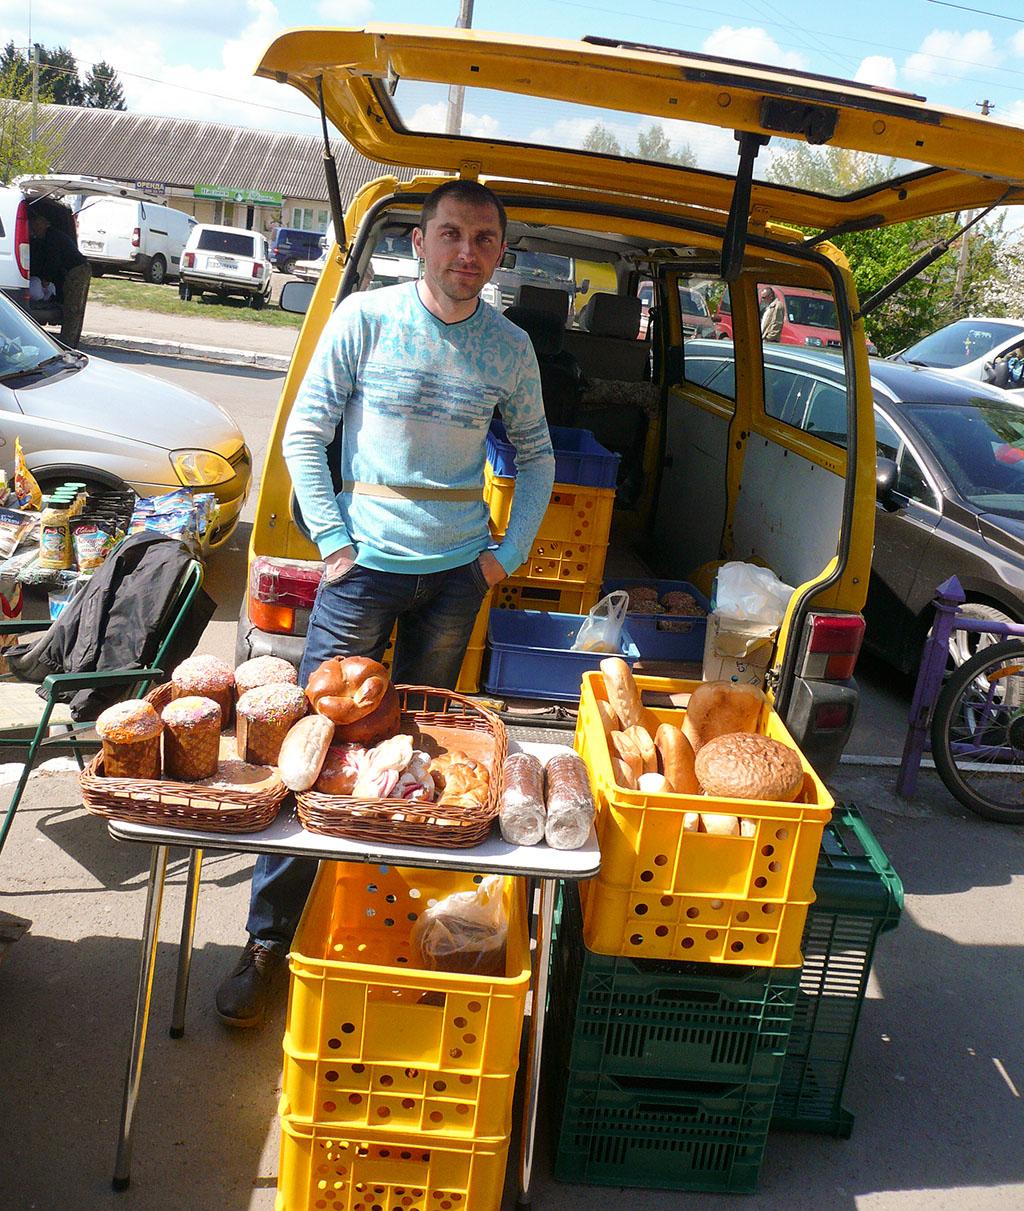 verkoop van brood